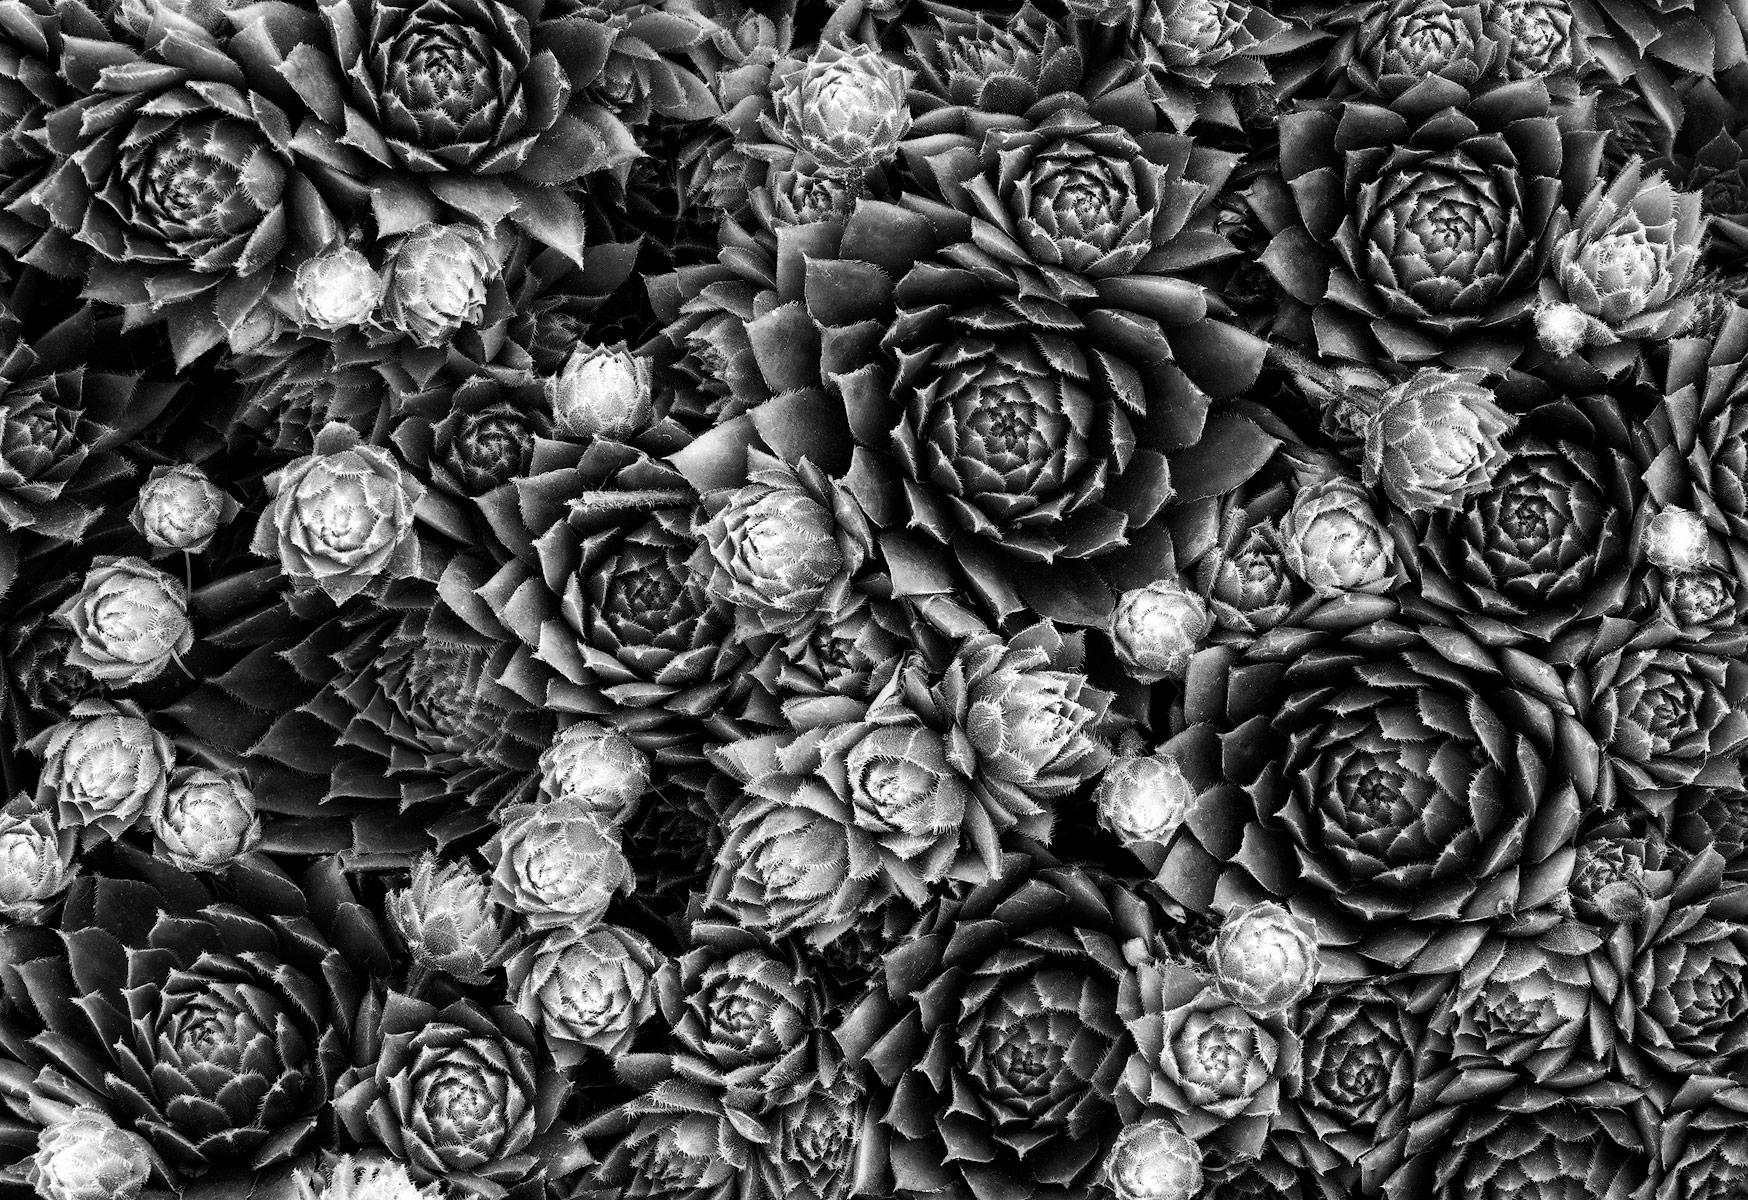 Sarah-Marino-Succulents-BW-1200px.jpg